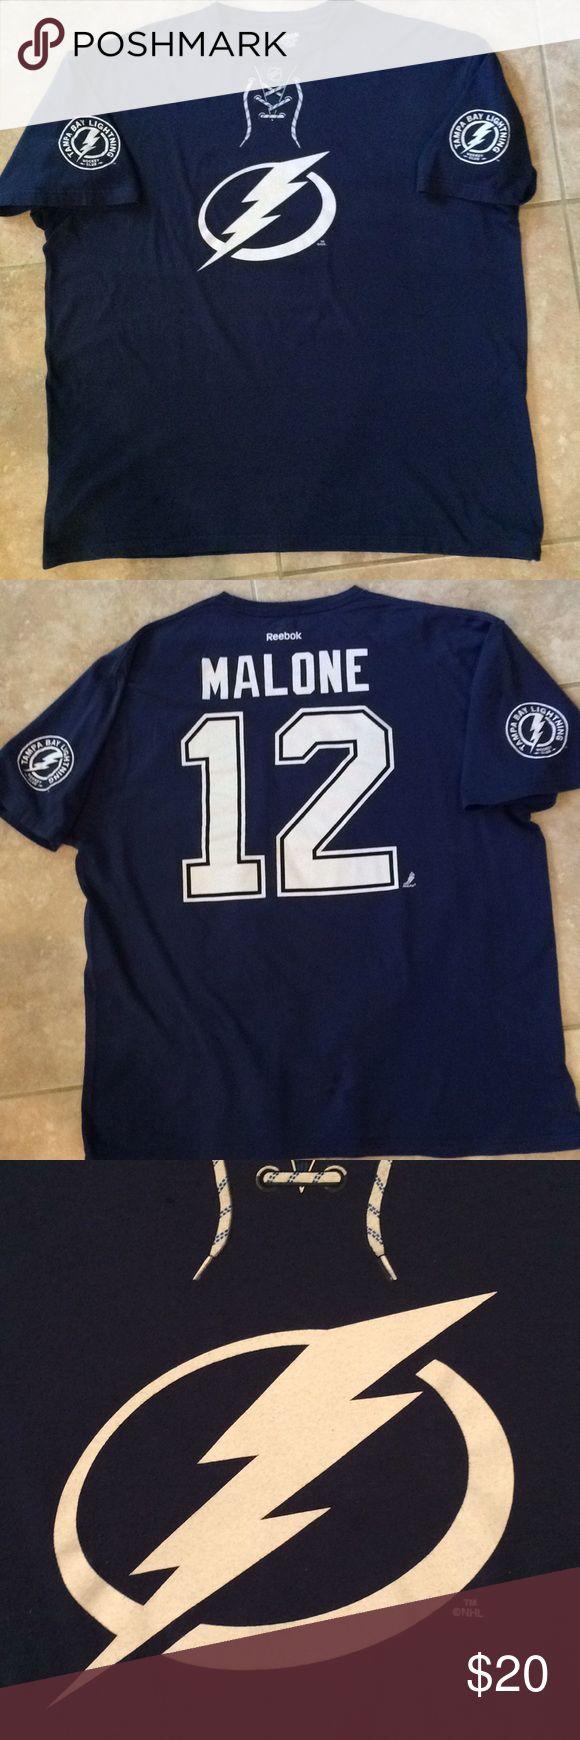 Men's Tampa Bay Lightning Hockey Club Tee Men's Tampa Bay Lightning Hockey Club Tee. #12 Malone Reebok Shirts Tees - Short Sleeve